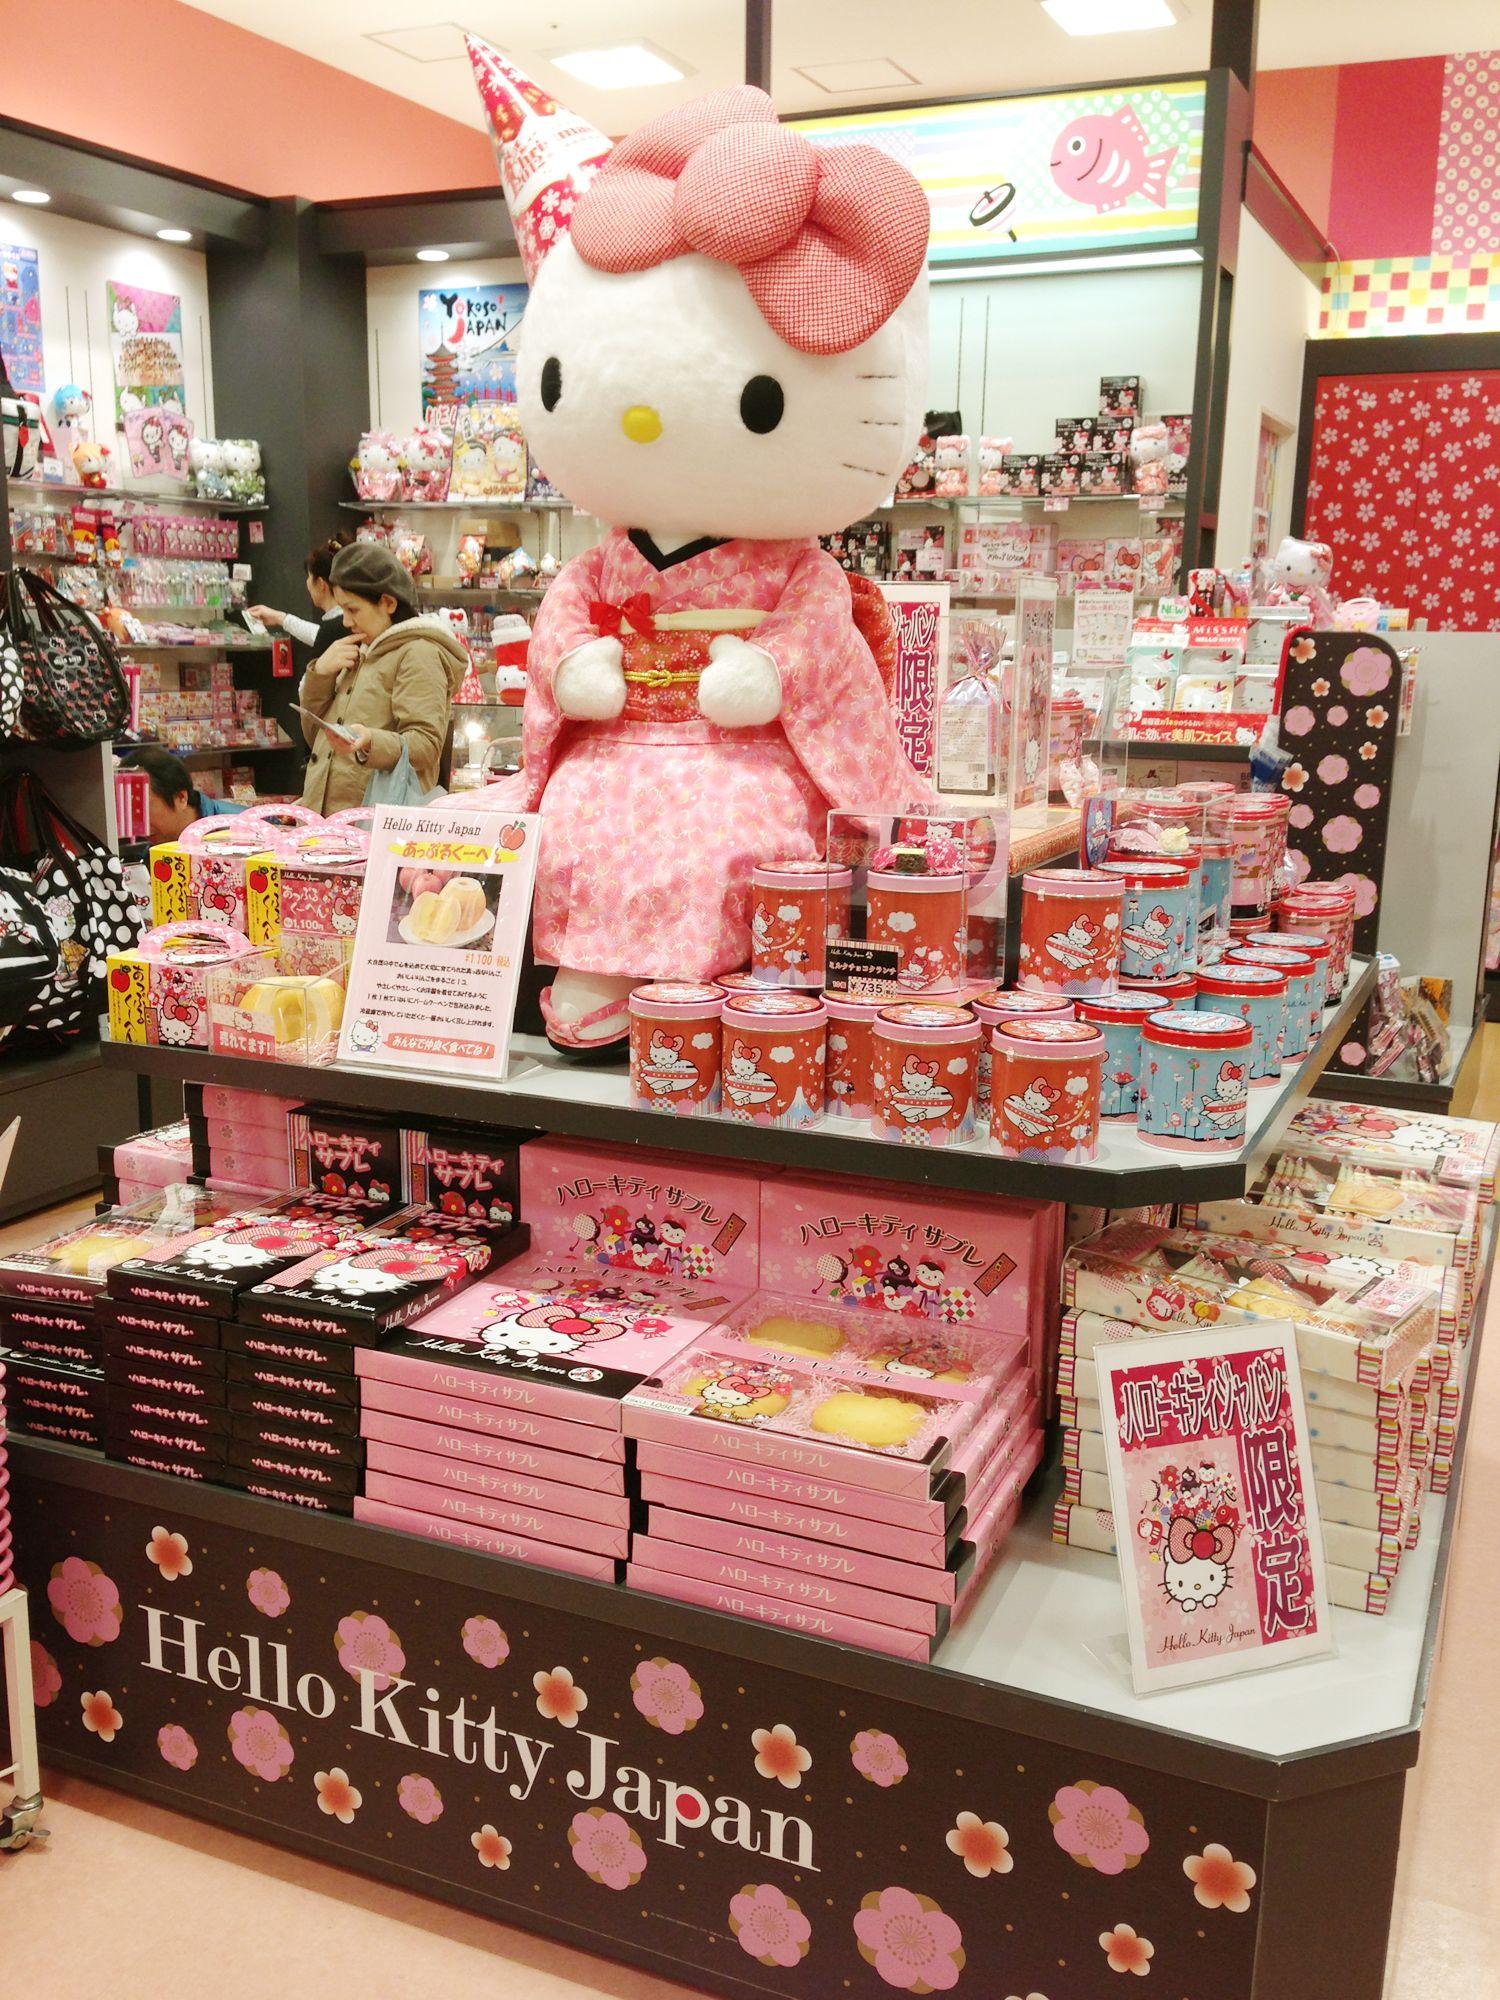 Kiddyland Tokyo Japan Hello Kitty Store Japan Tokyo